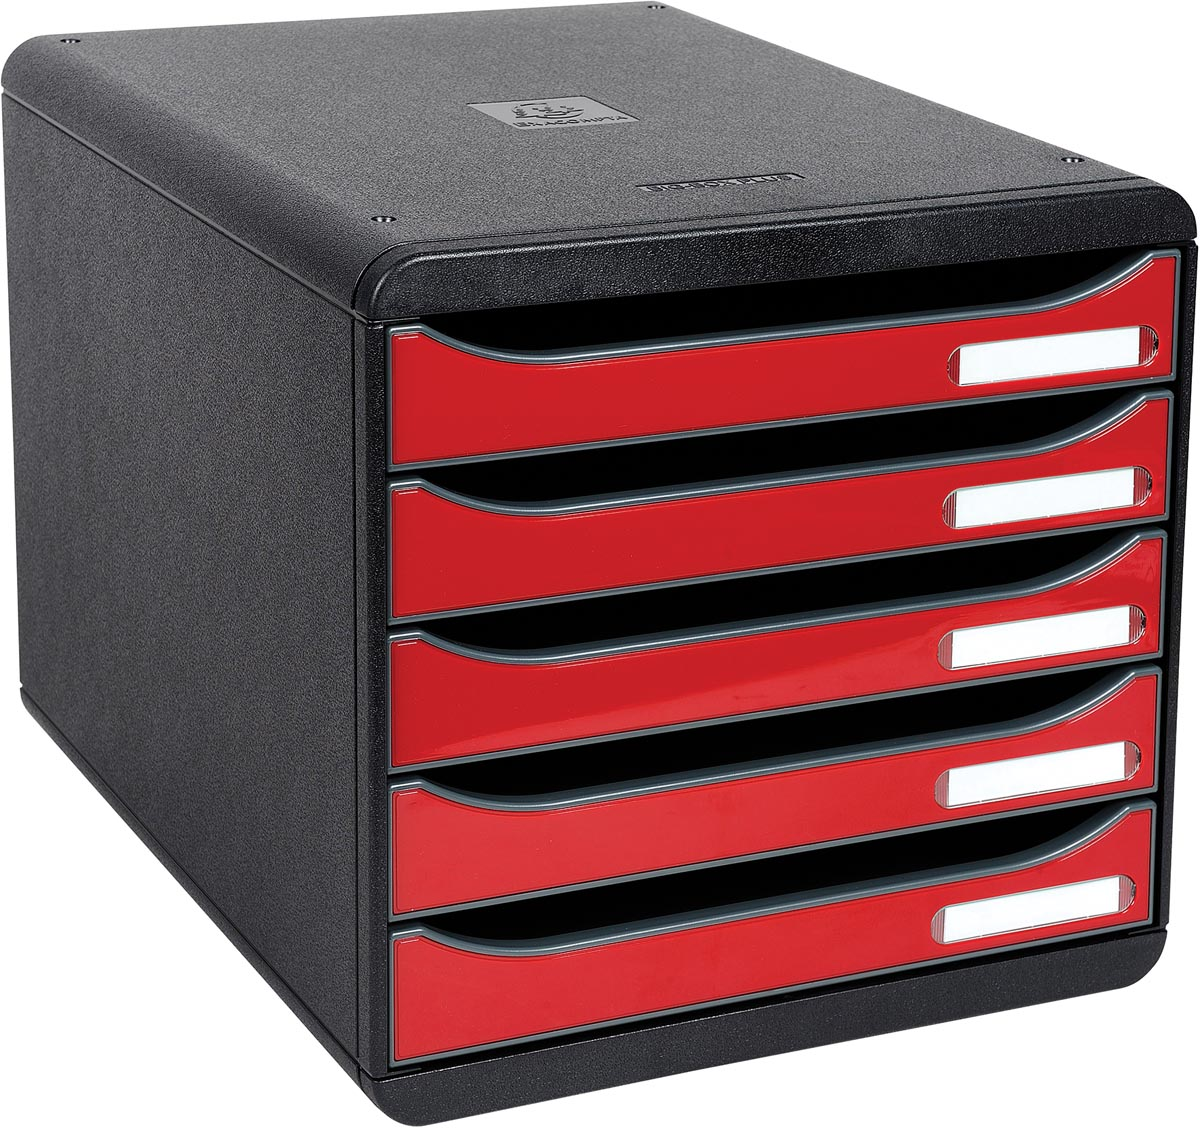 Exacompta ladenblok Big-Box Plus zwart/rood